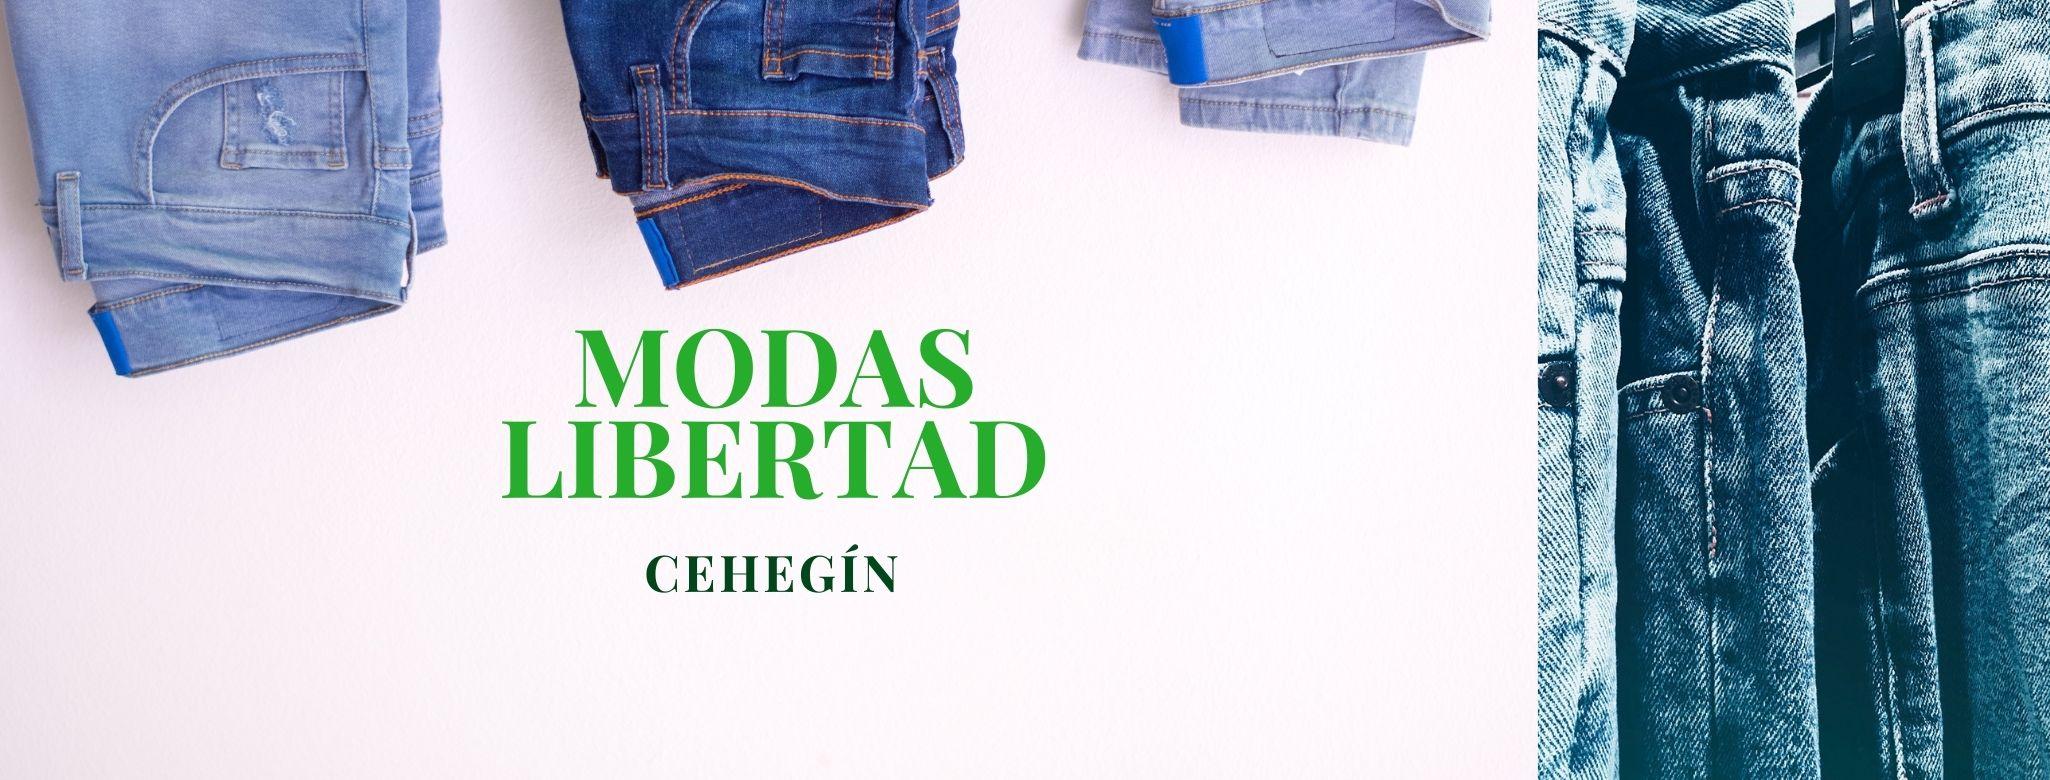 Modas Libertad